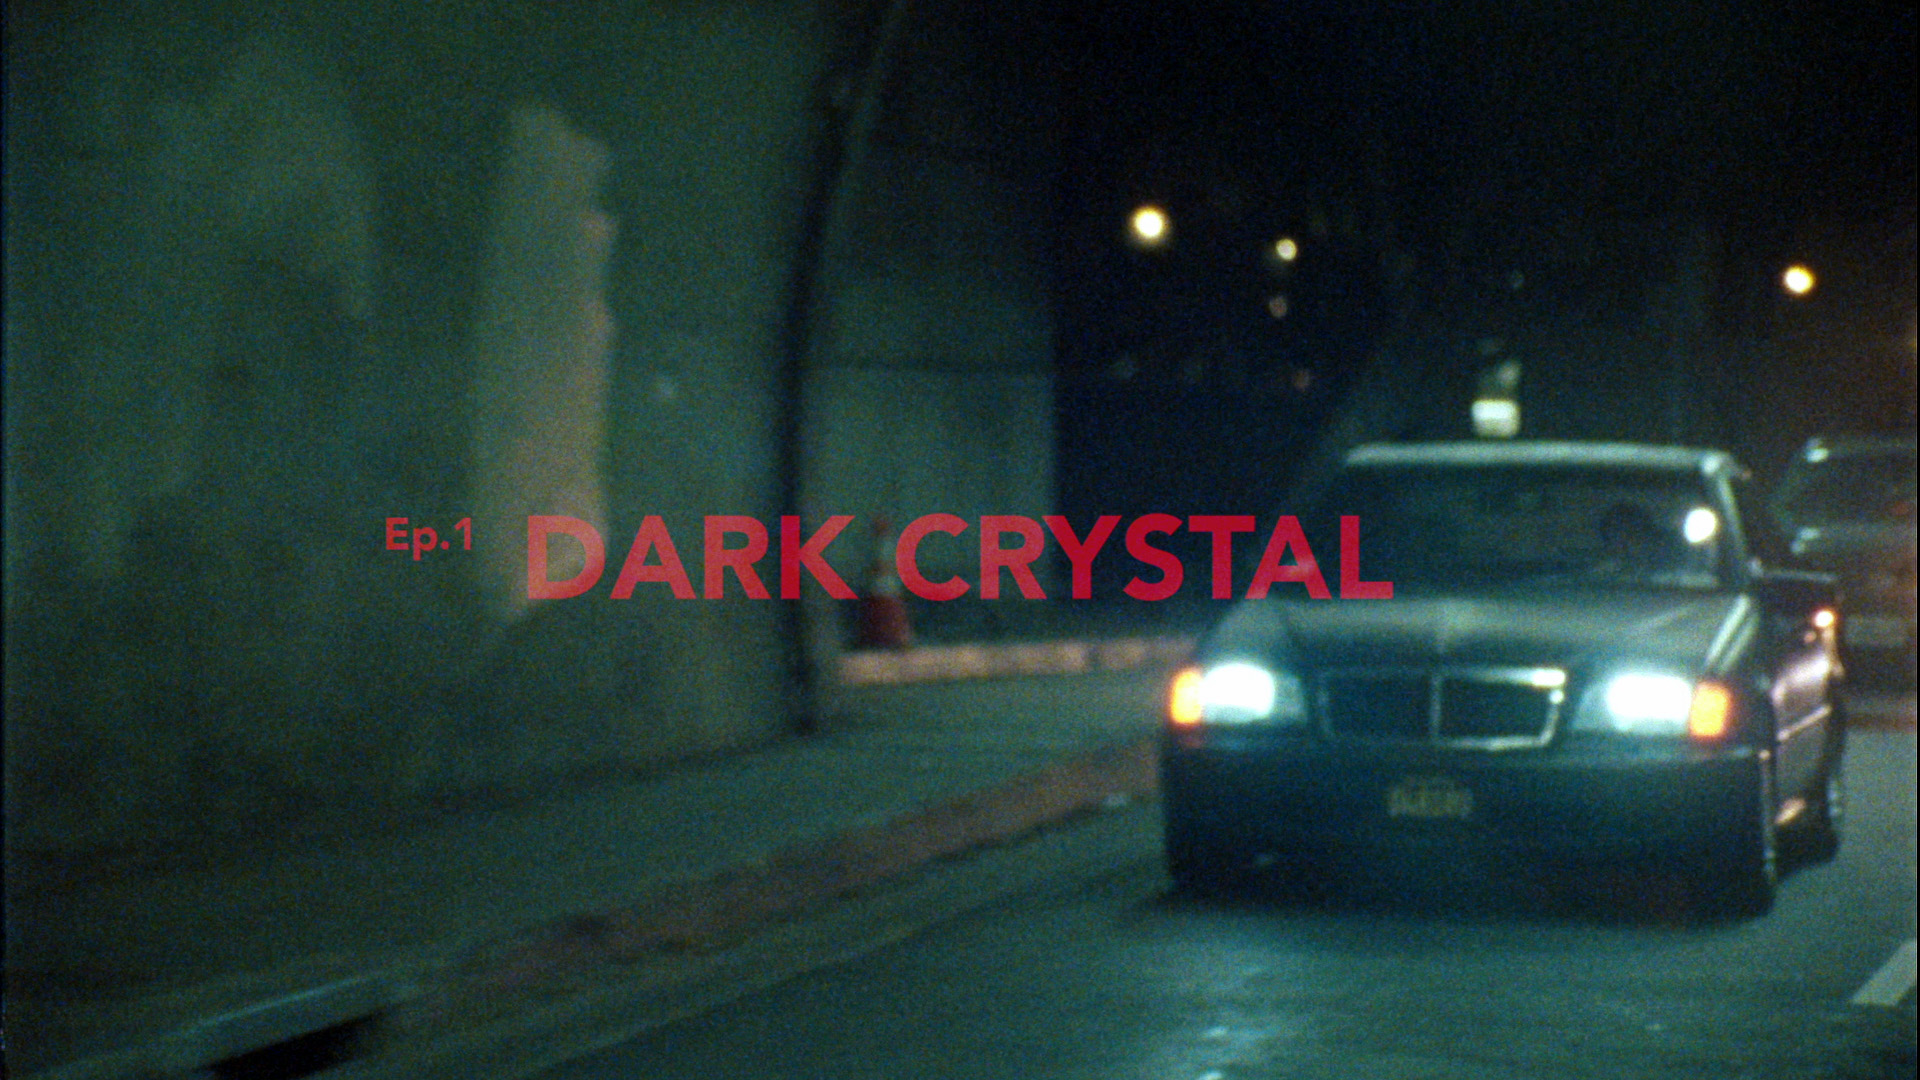 Ep 1 : Dark Crystal